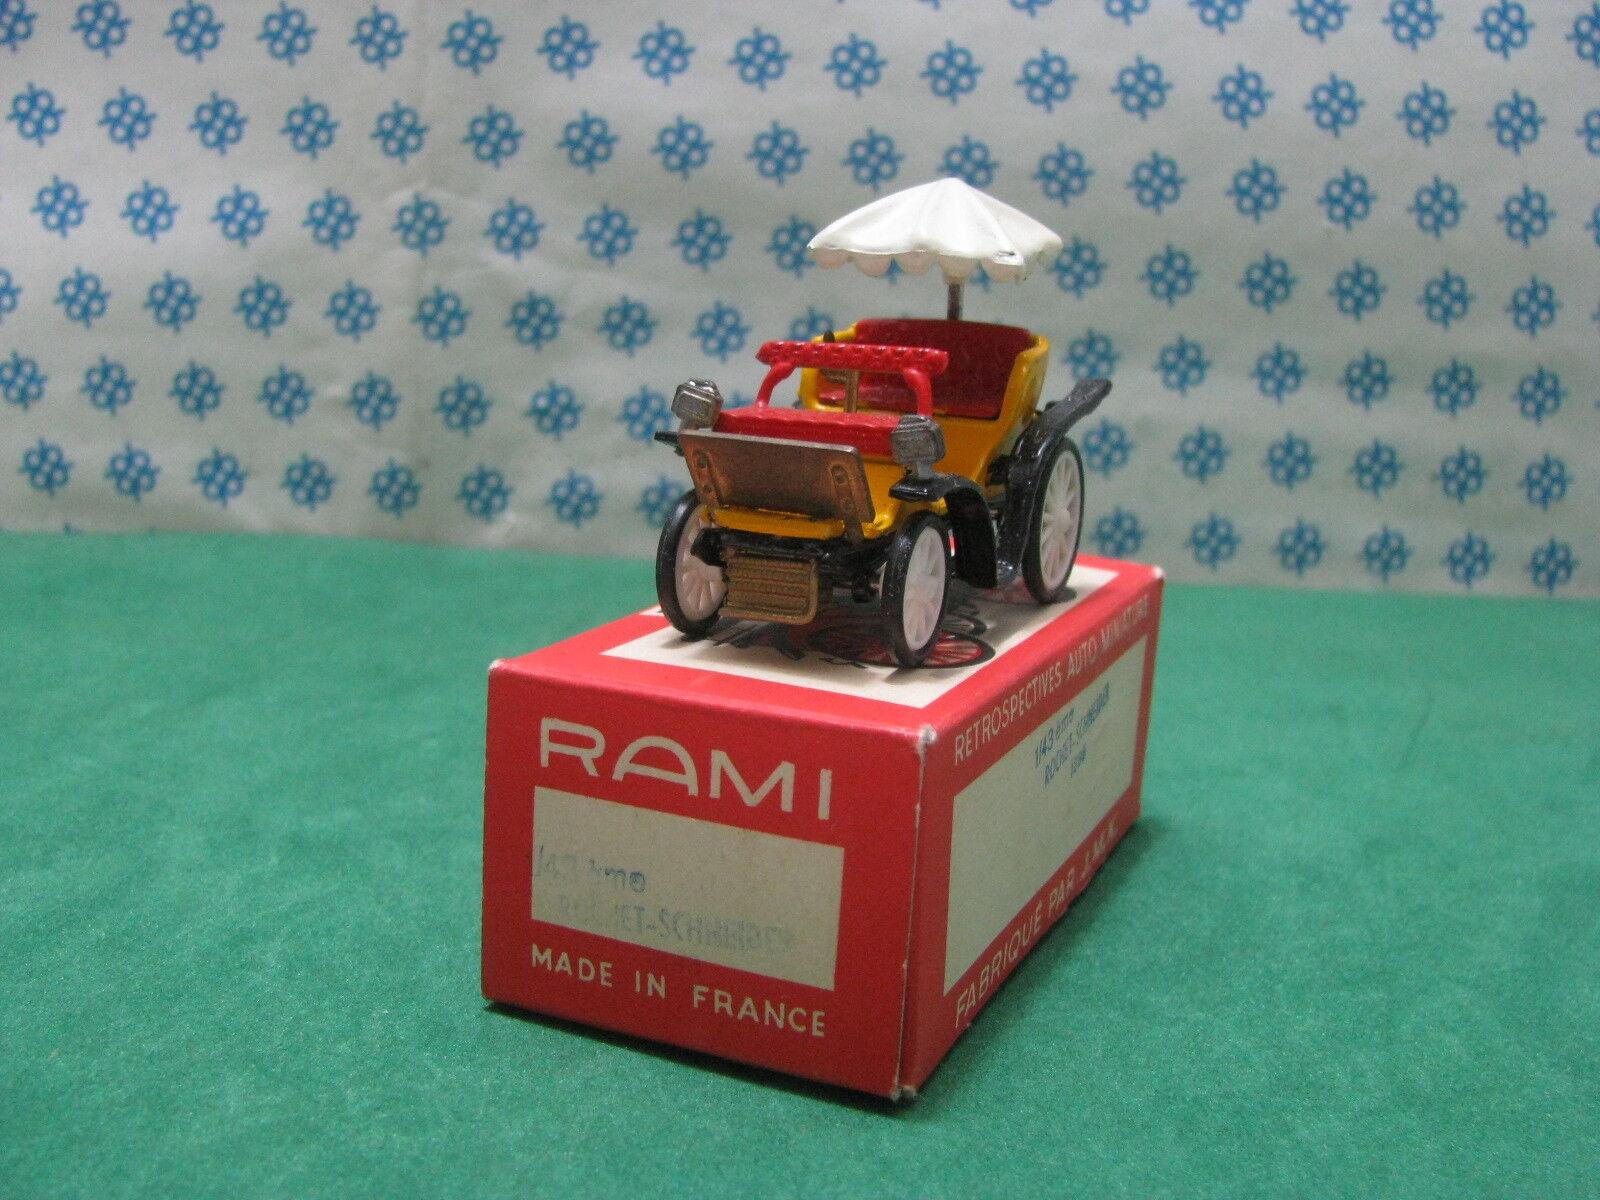 Vintage Rami - Rochet - Schneider 1895 - 1 43 France